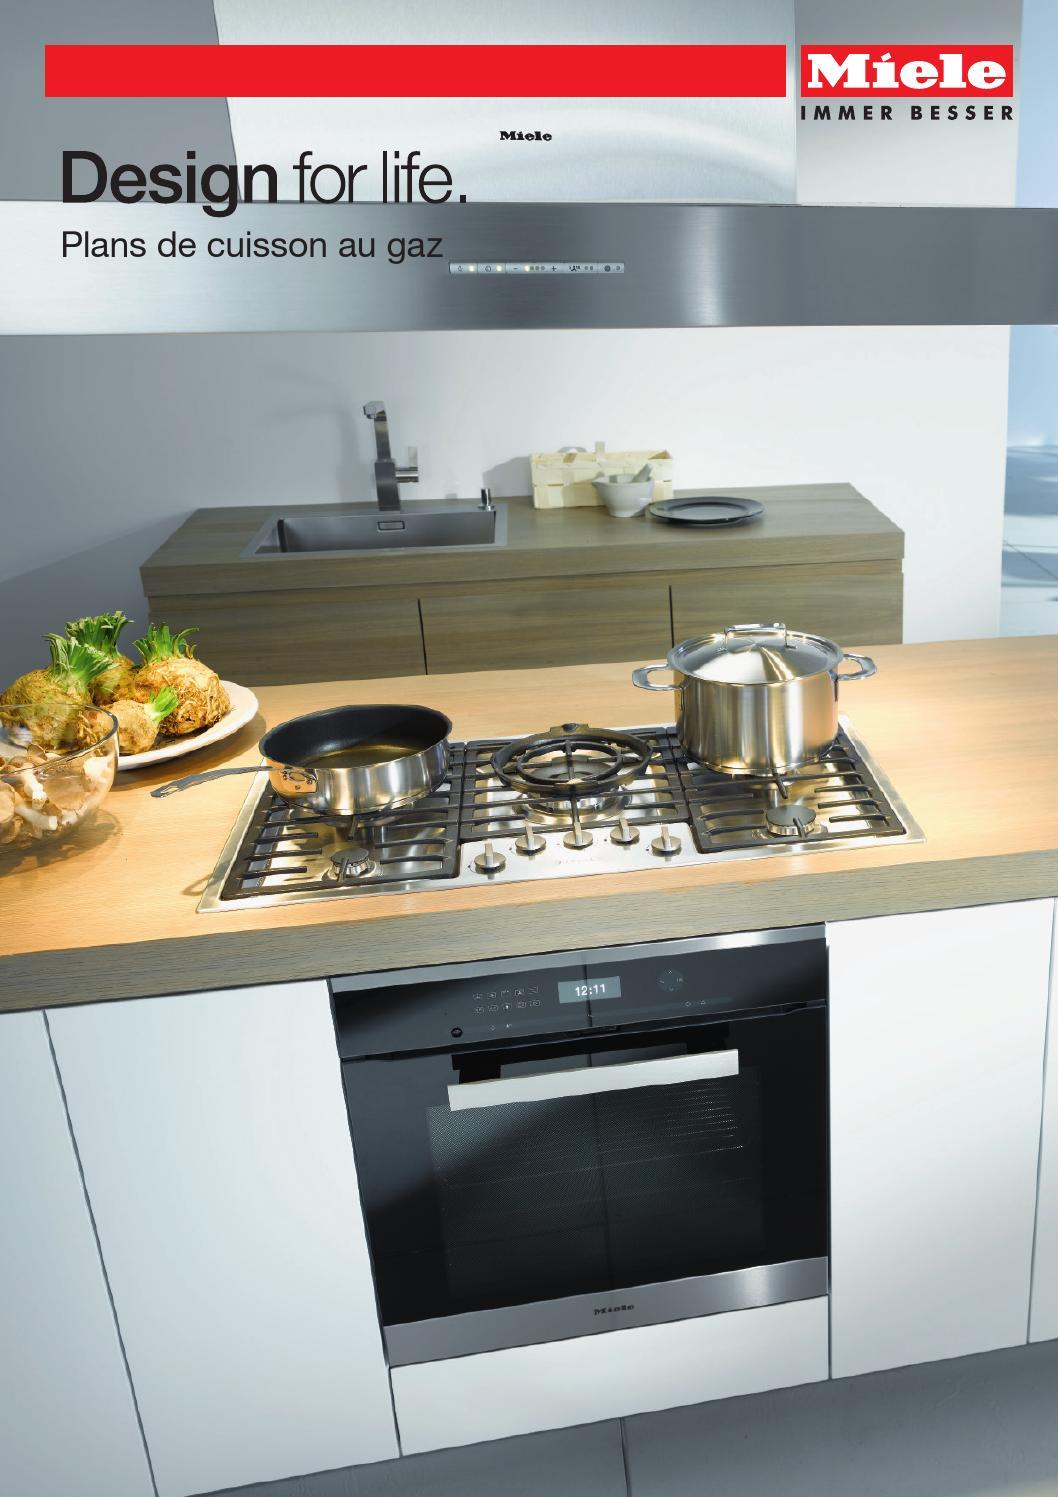 miele catalogue plans de cuisson au gaz be fr by miele issuu. Black Bedroom Furniture Sets. Home Design Ideas